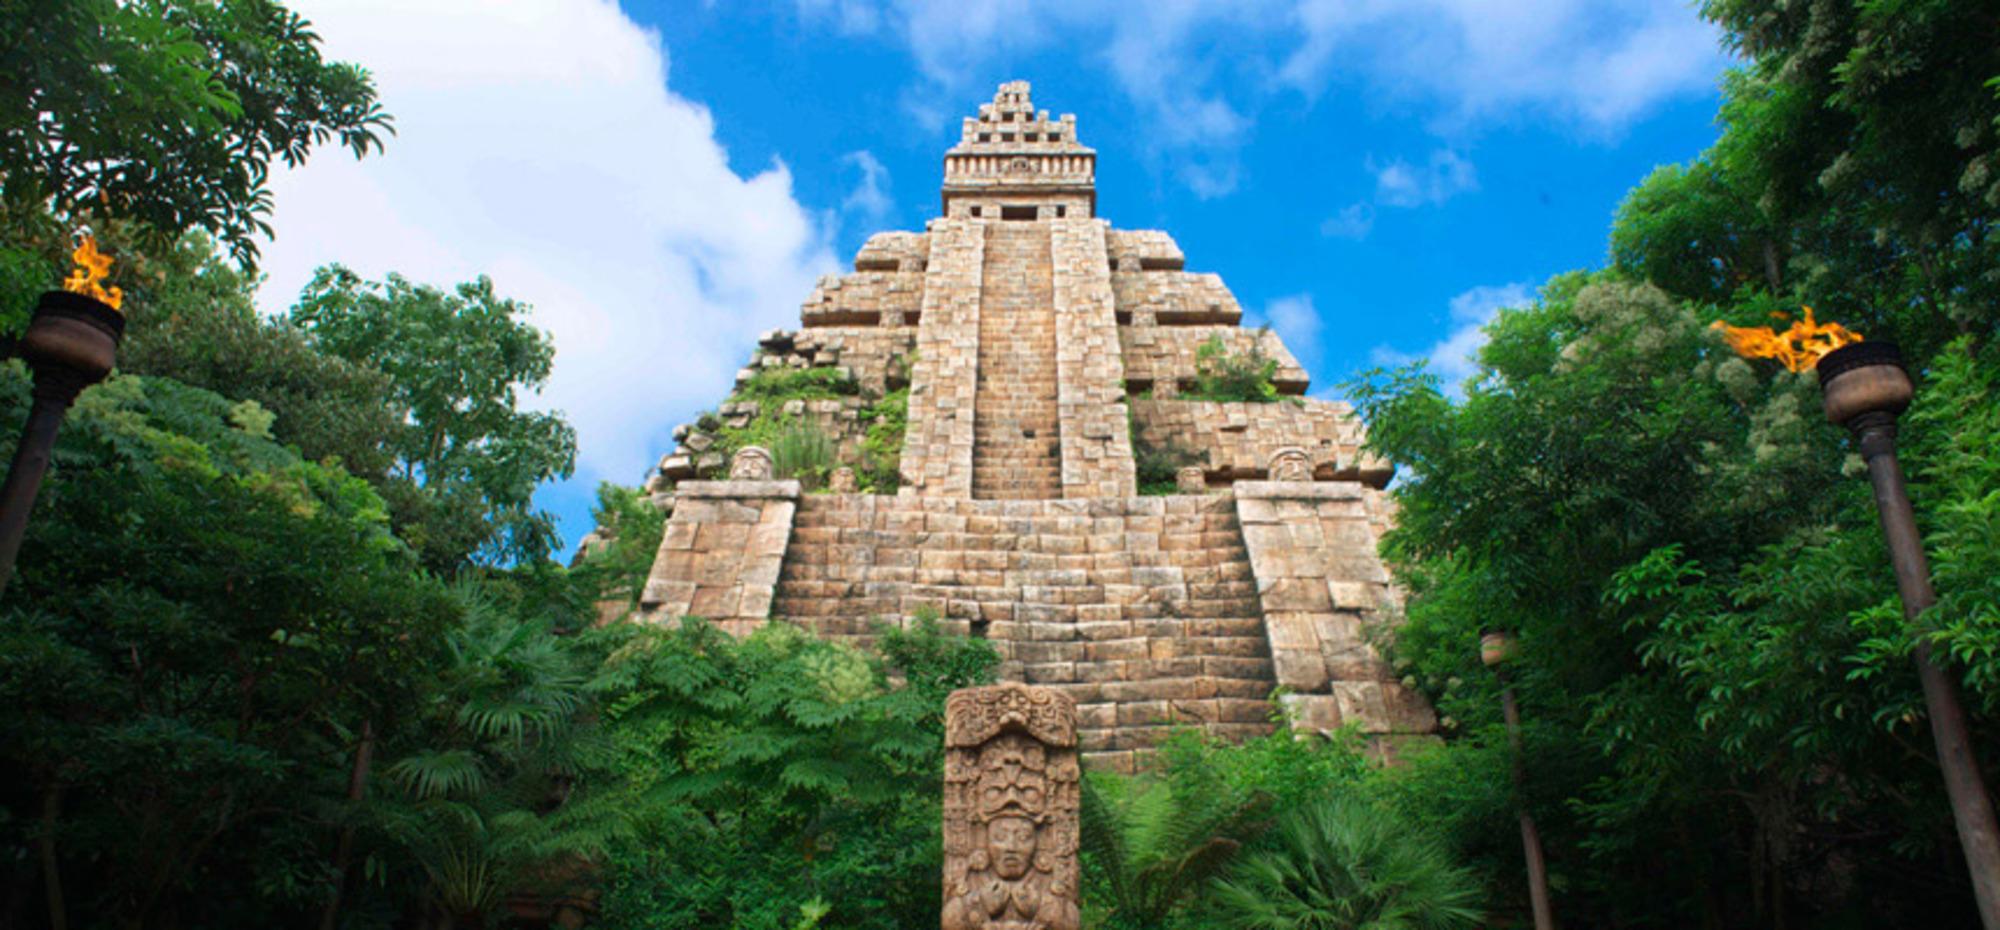 indiana jones adventure temple crystal skull tokyo disneysea